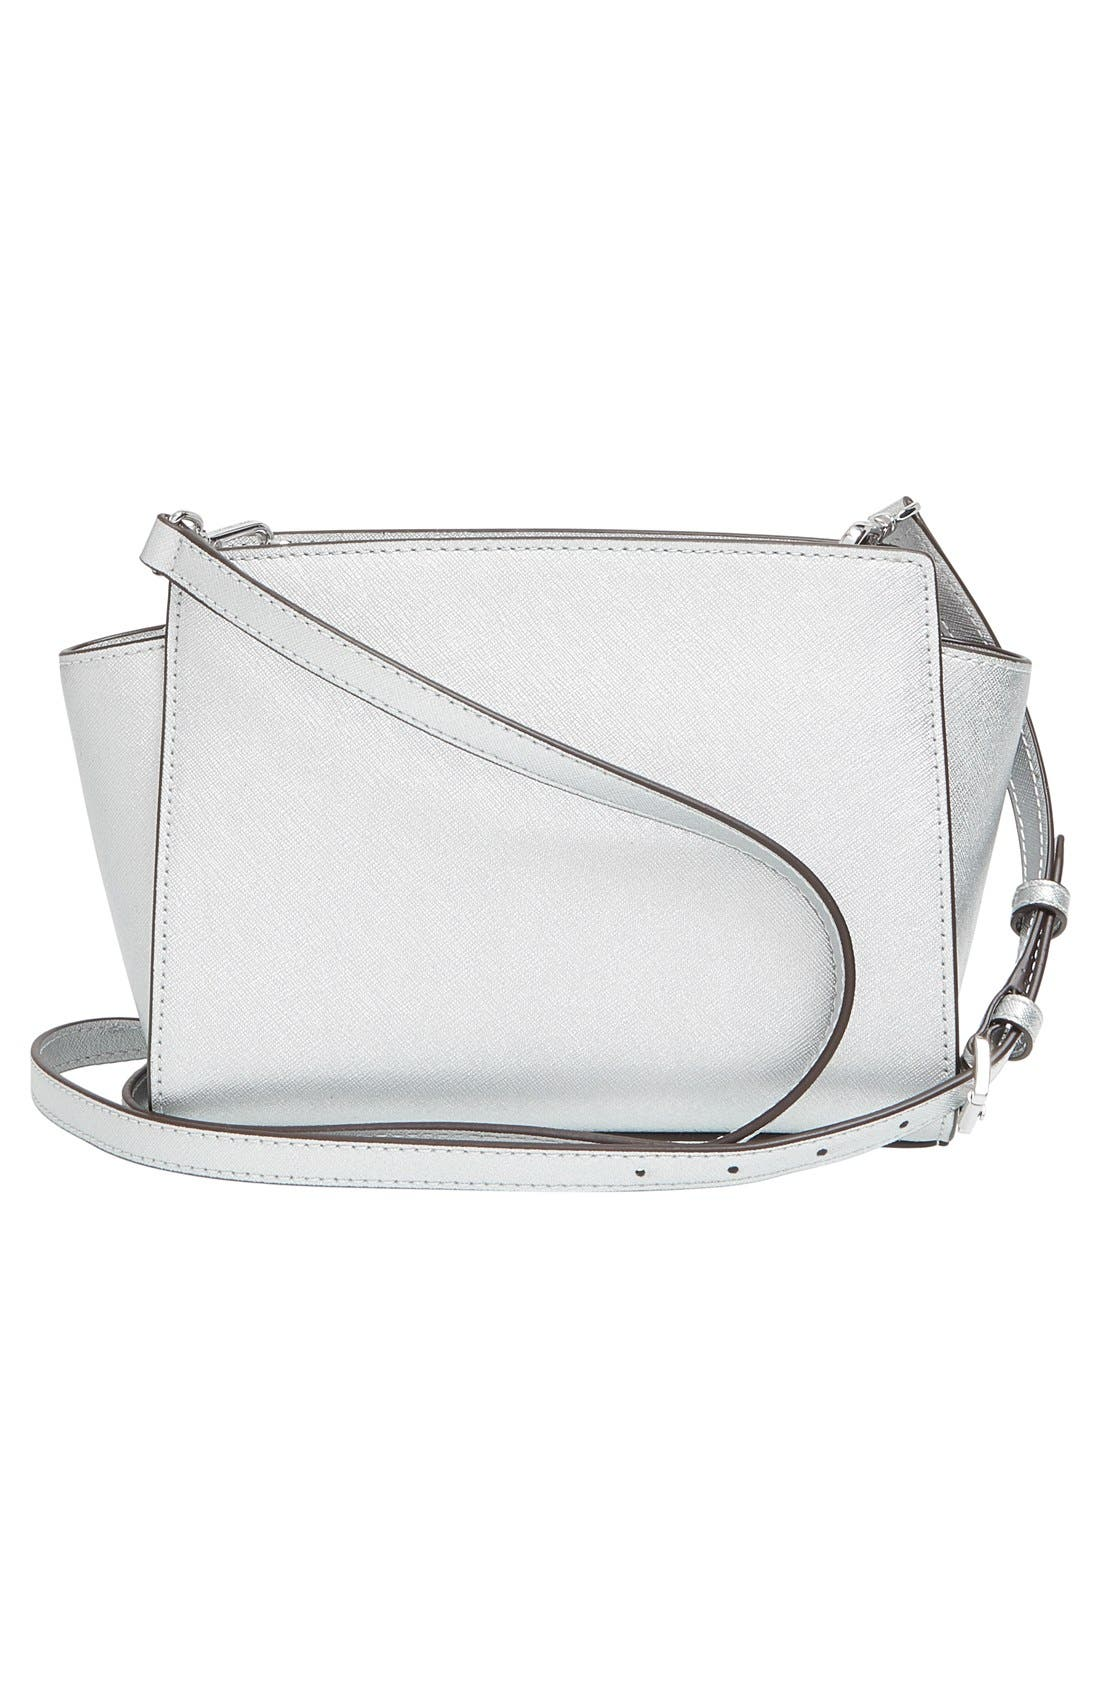 Alternate Image 3  - MICHAEL Michael Kors 'Medium Selma' Metallic Leather Crossbody Bag